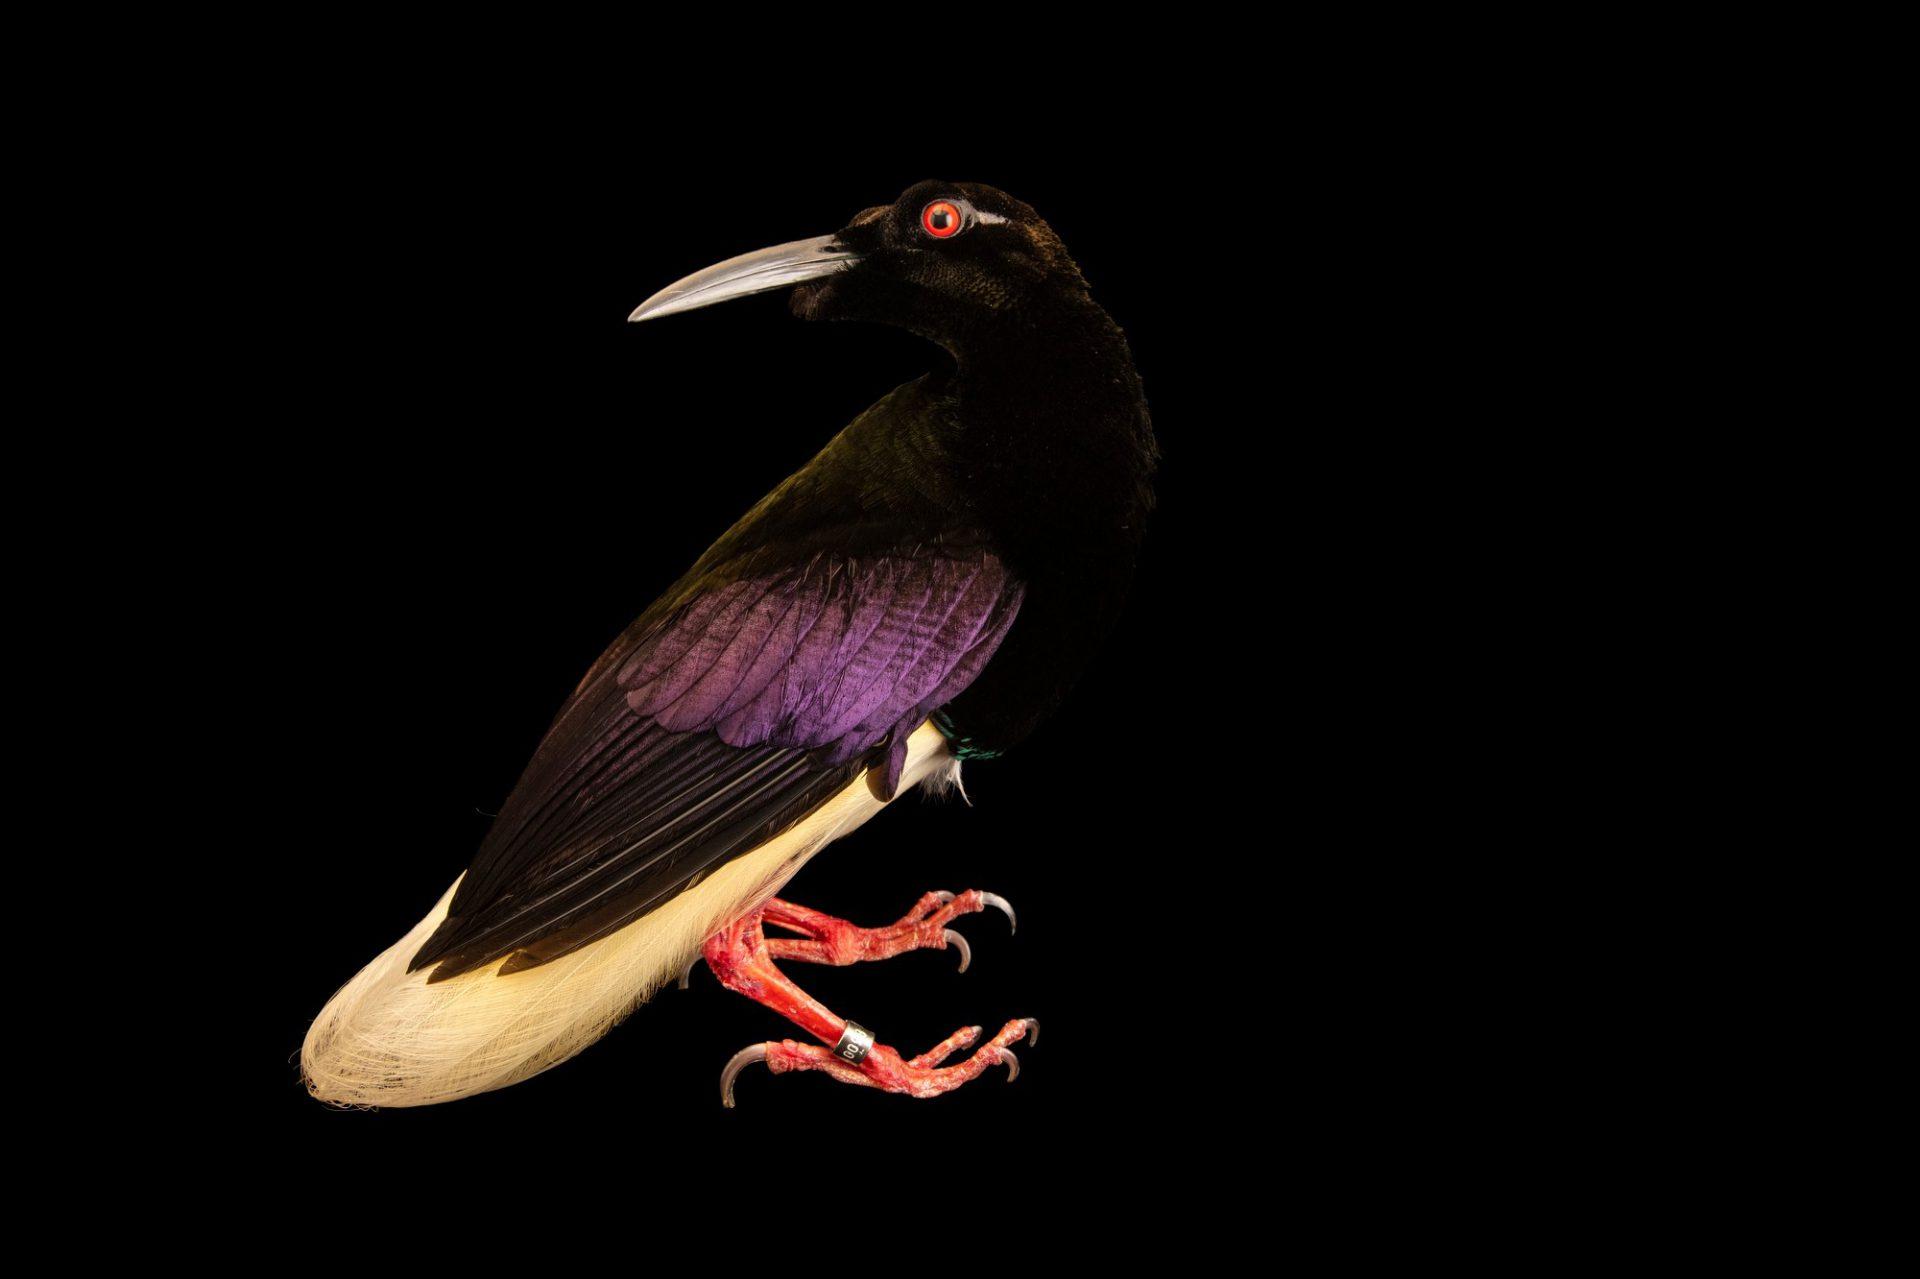 Photo: A twelve-wired bird-of-paradise (Seleucidis melanoleuca) at Taman Mini Indonesia Indah.